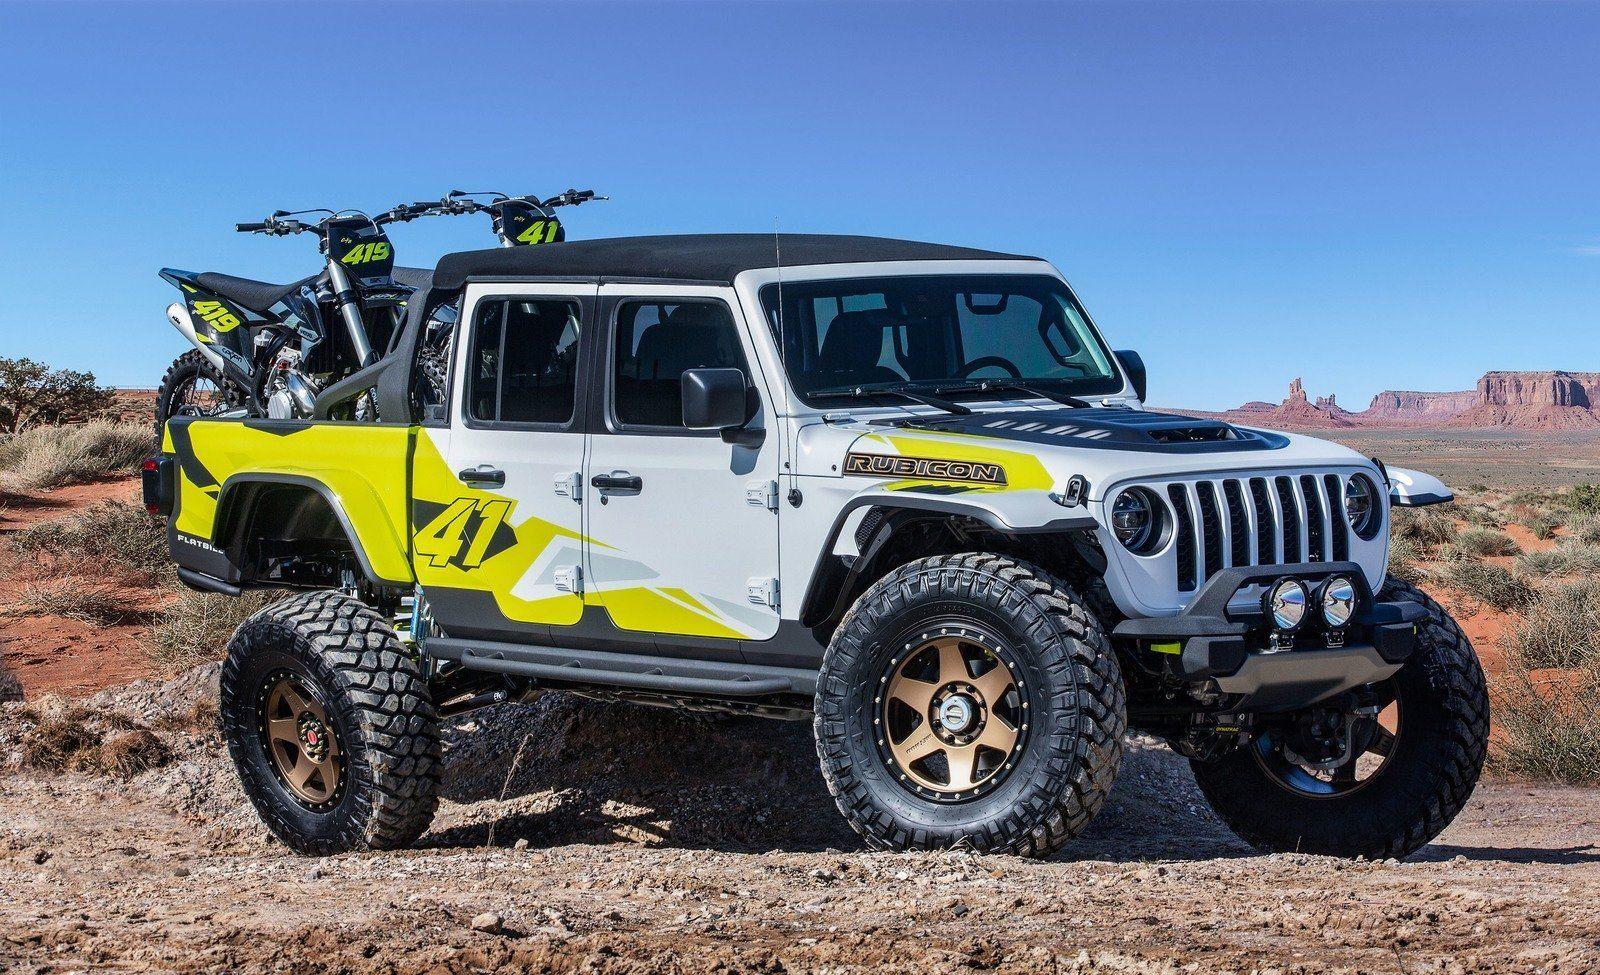 2020 Jeep Gladiator Jeep Pickup Trucks Revived Jeep Gladiator Easter Jeep Safari Jeep Pickup